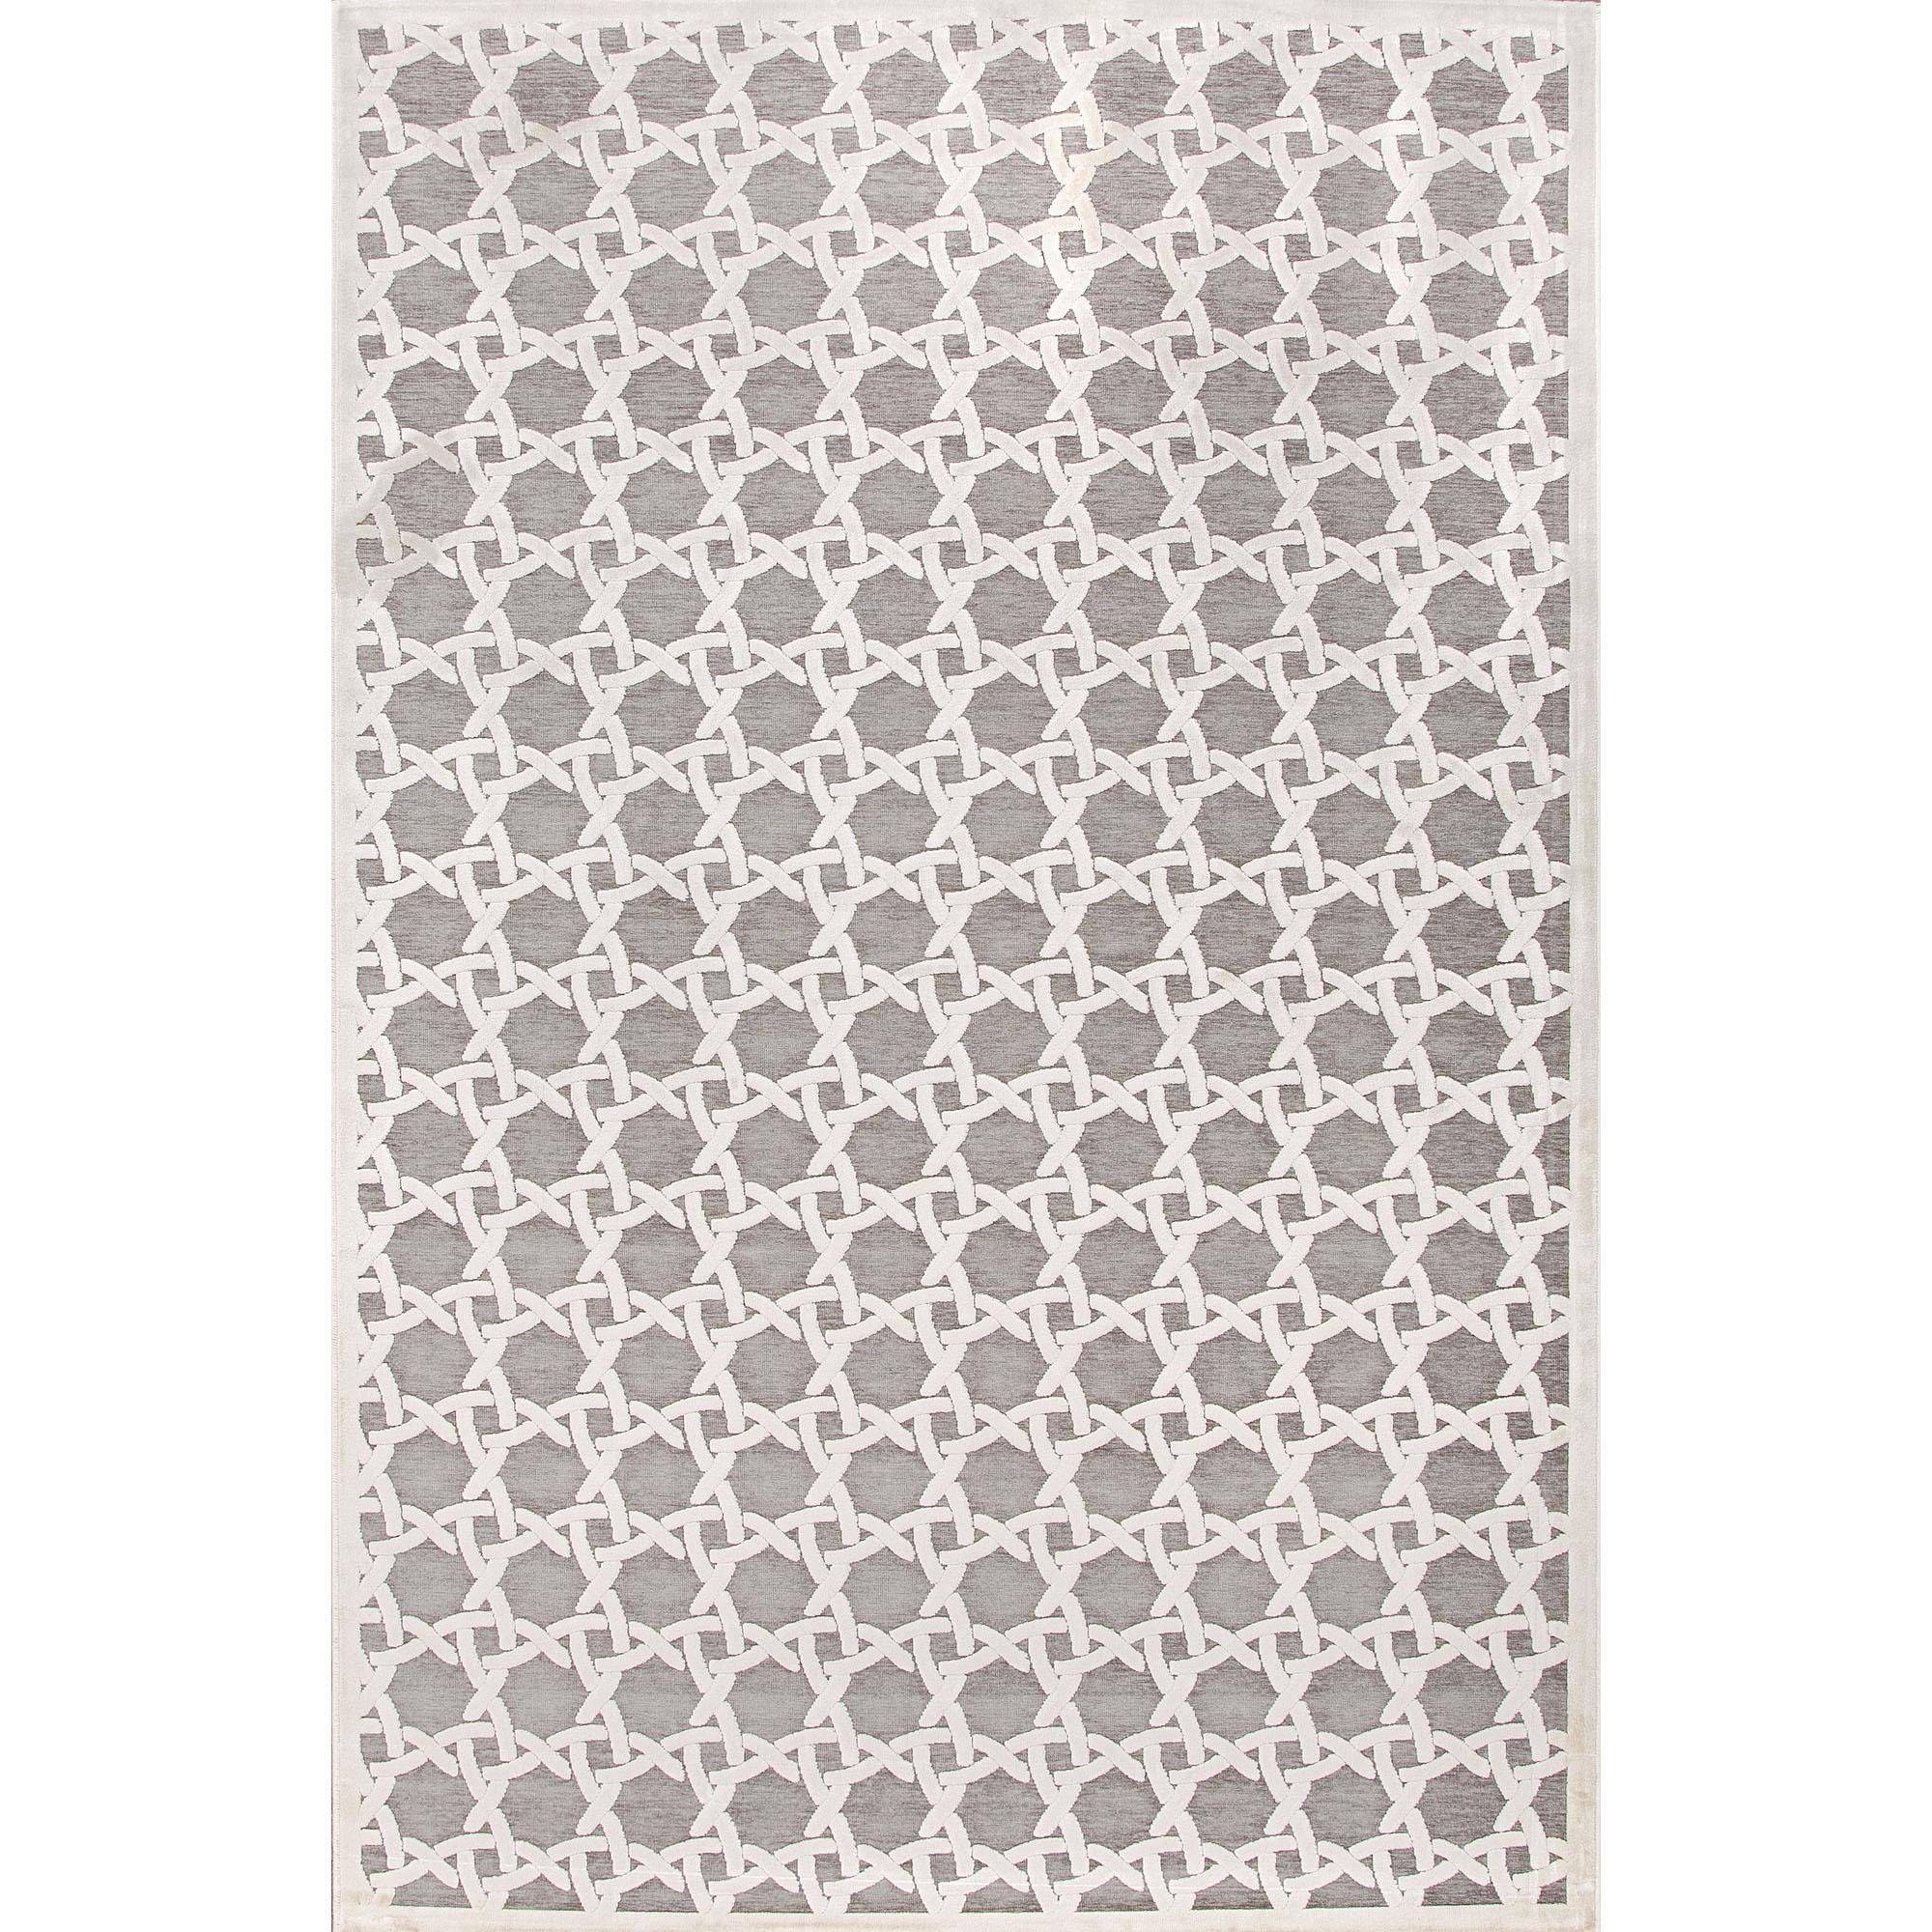 JAIPUR Rugs Fables 5 x 7.6 Rug - Item Number: RUG108694